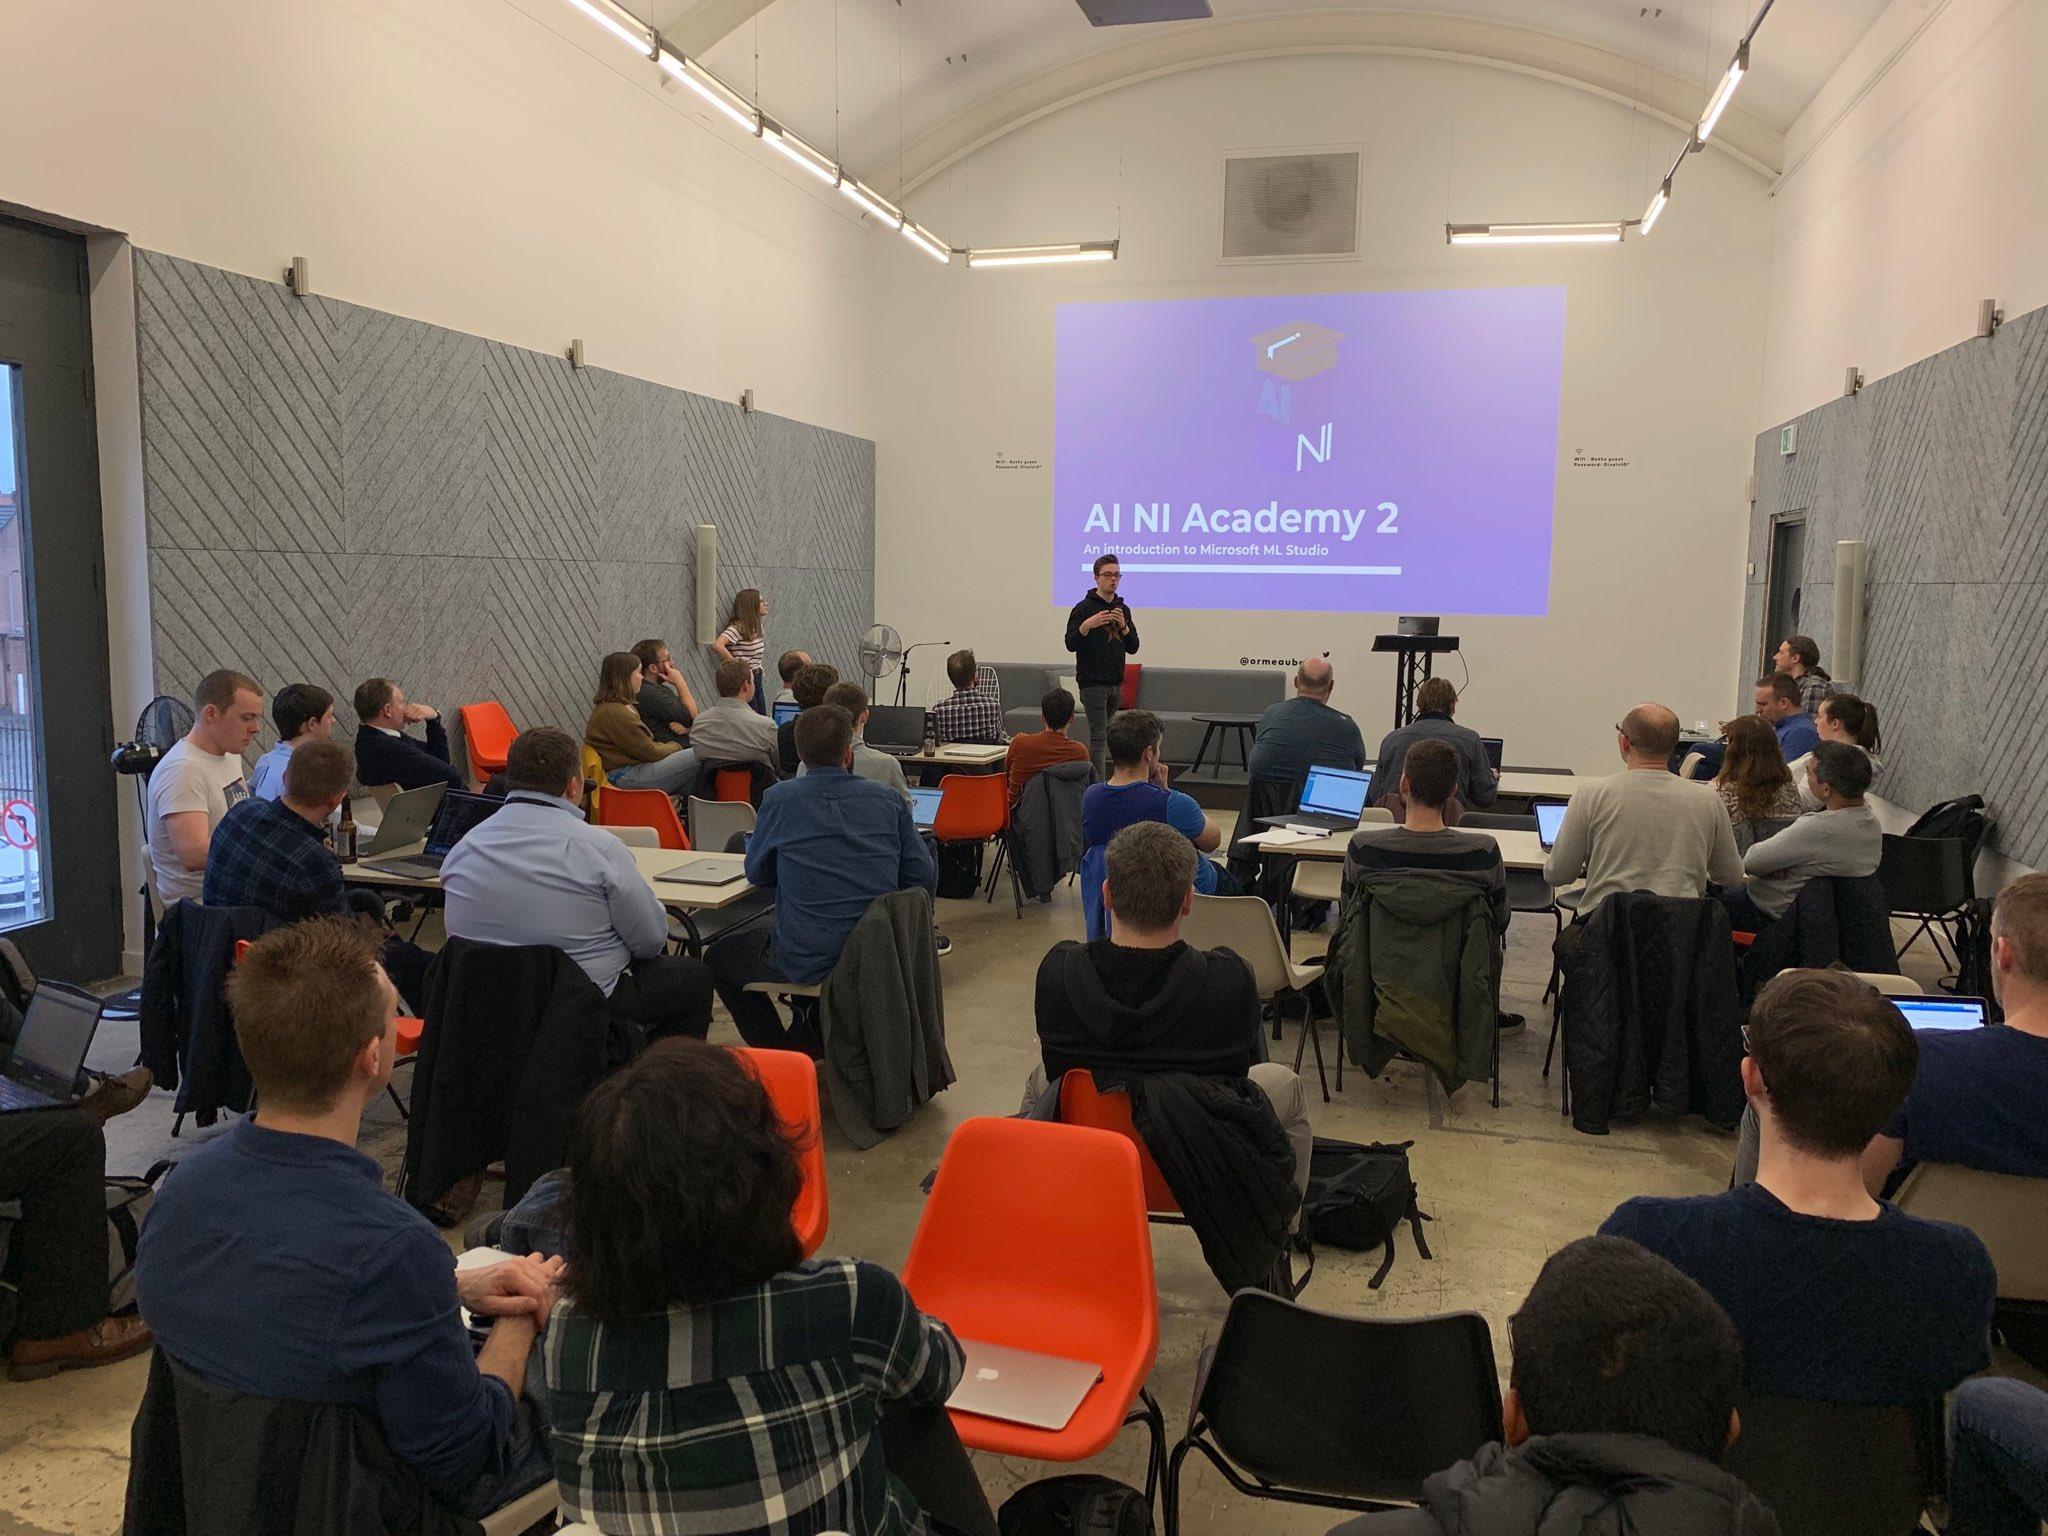 AI NI #2 – An Introduction to Microsoft ML Studio